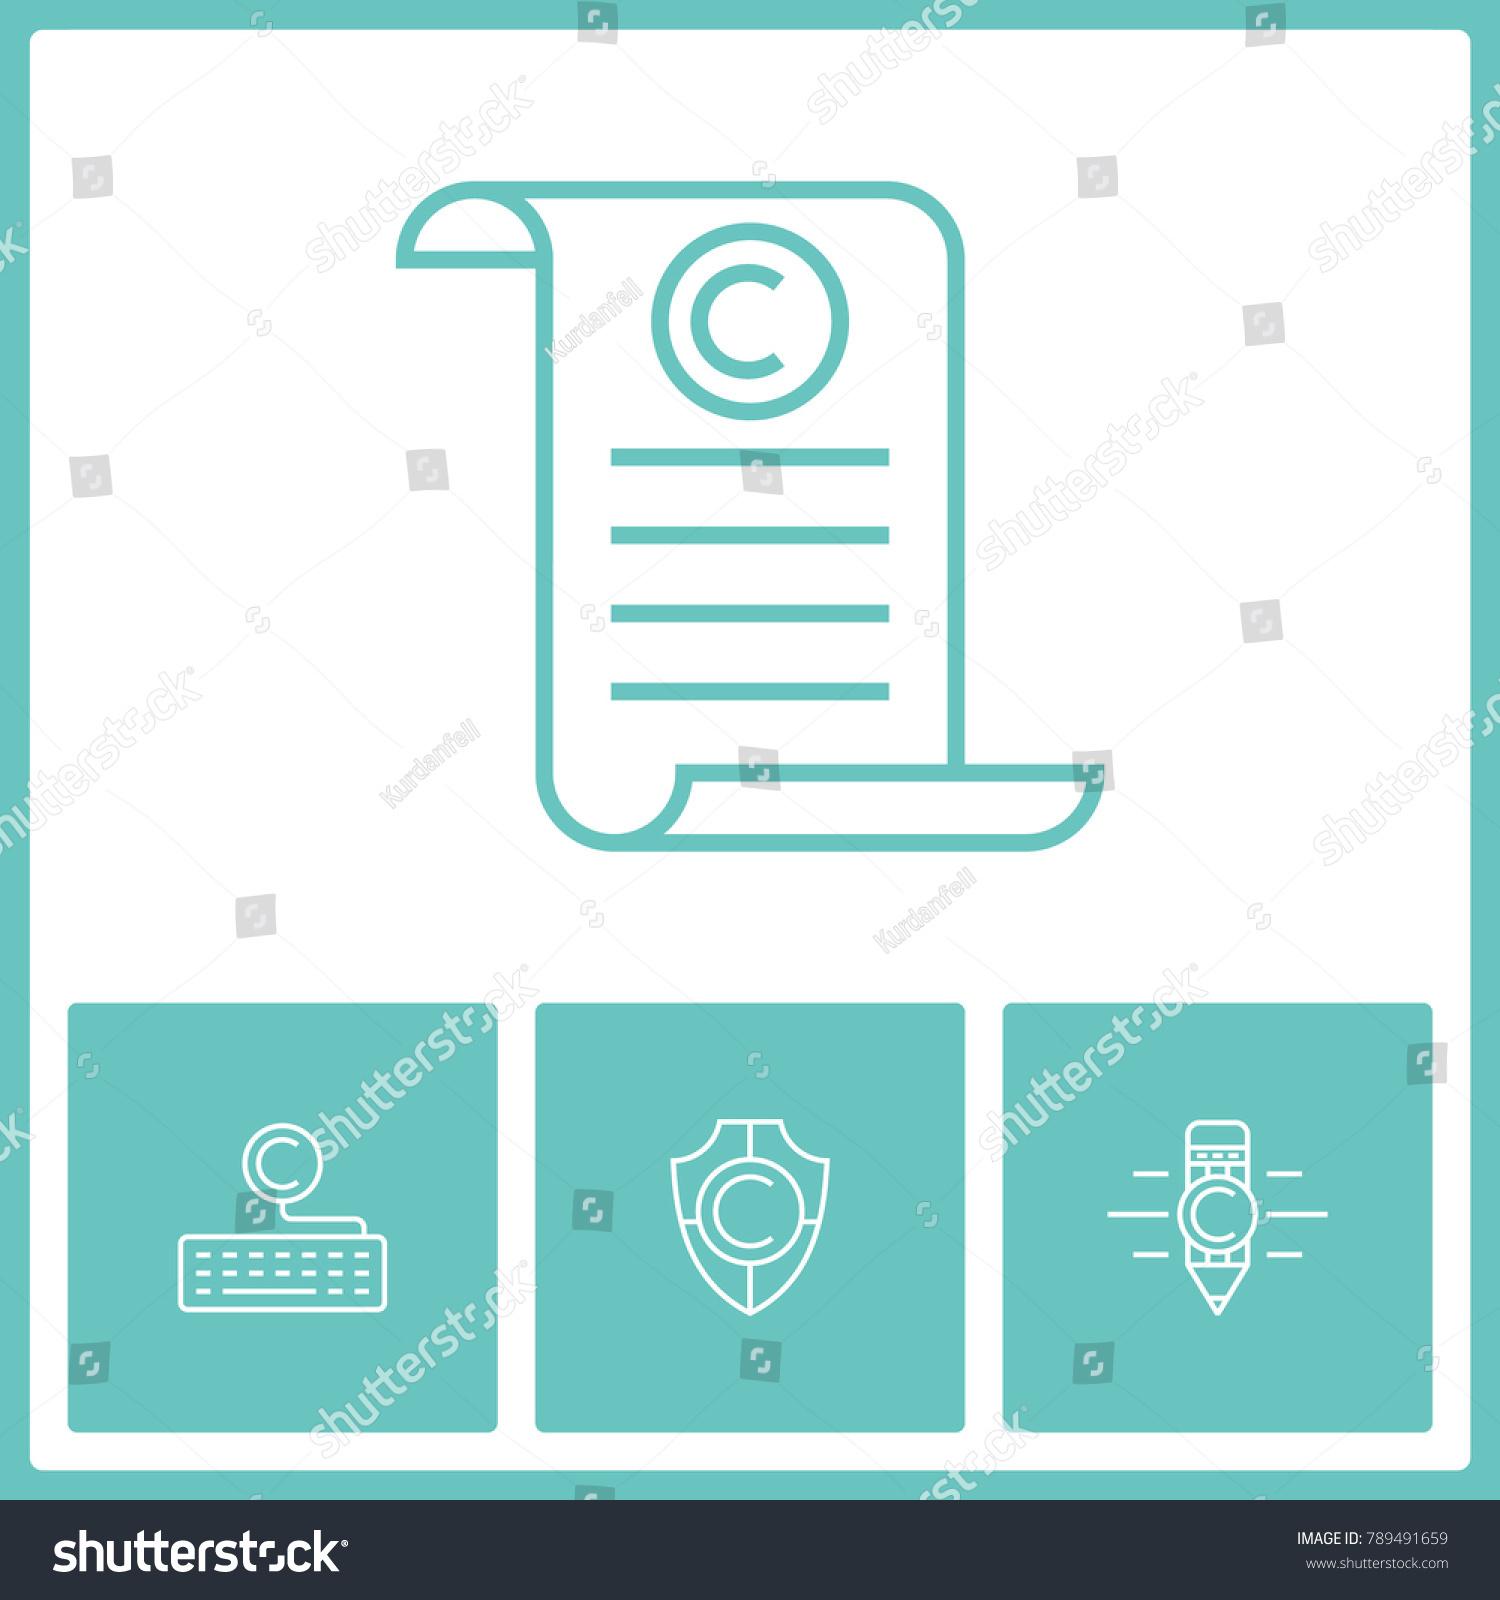 Copyright Intellectual Property Vector Line Icons Stock Vector